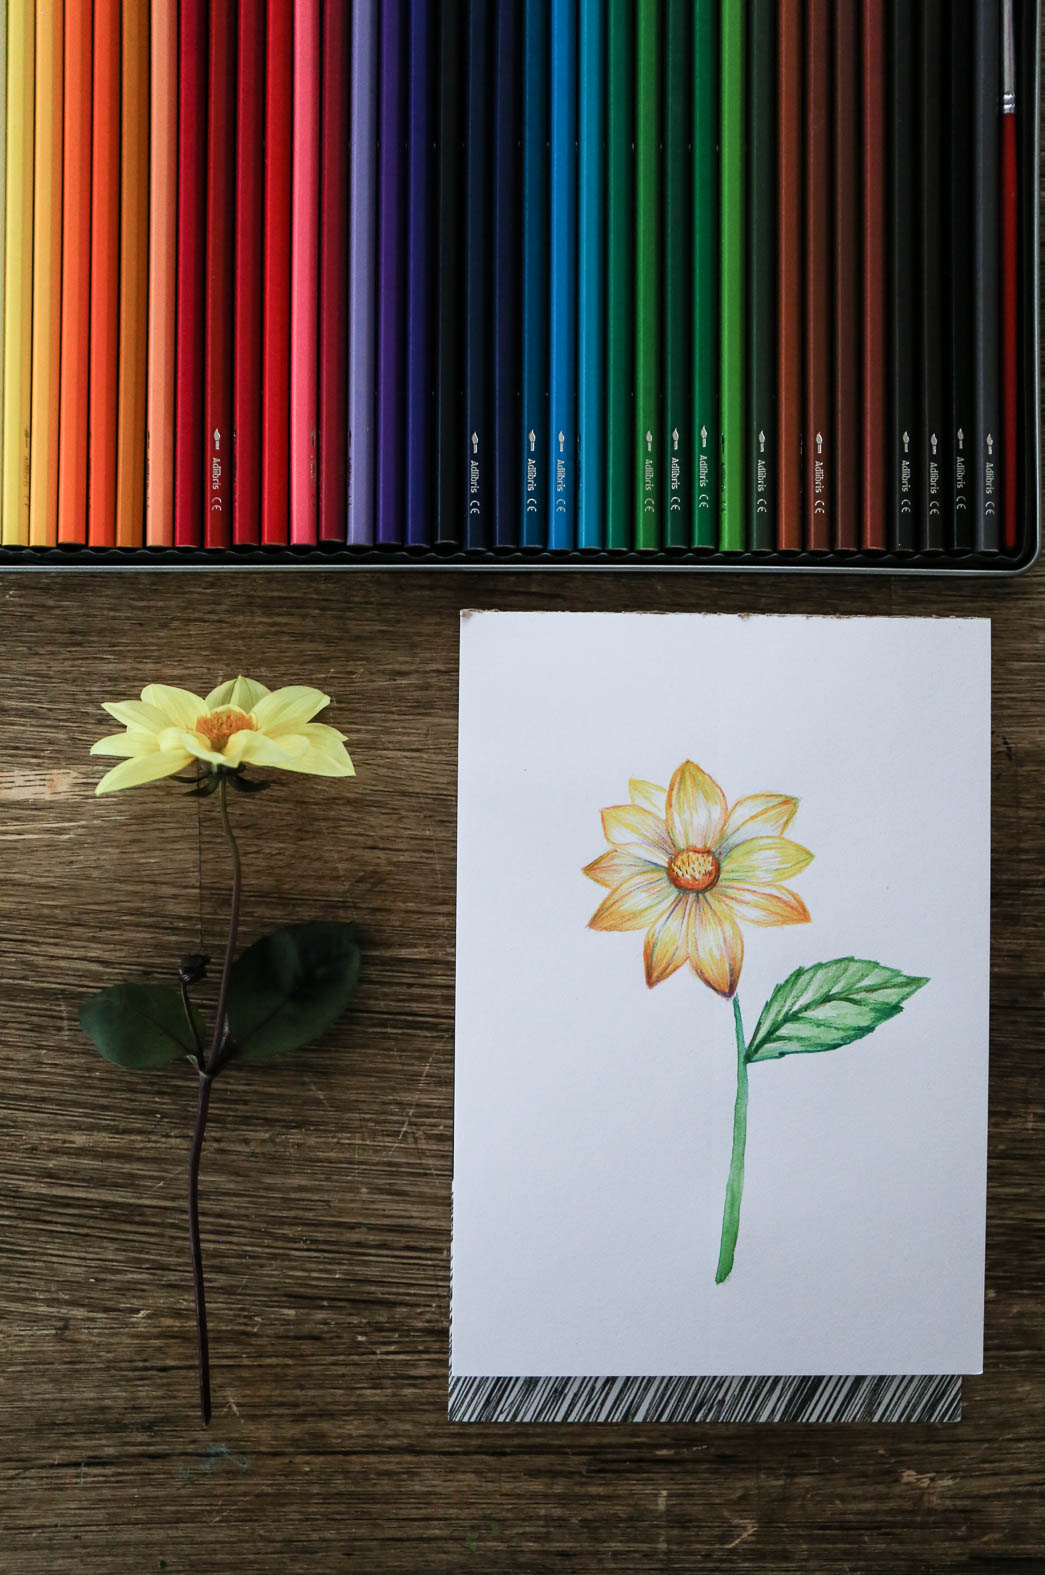 HannaWendelbo_akvarellpennor_AdLibris-3.jpg